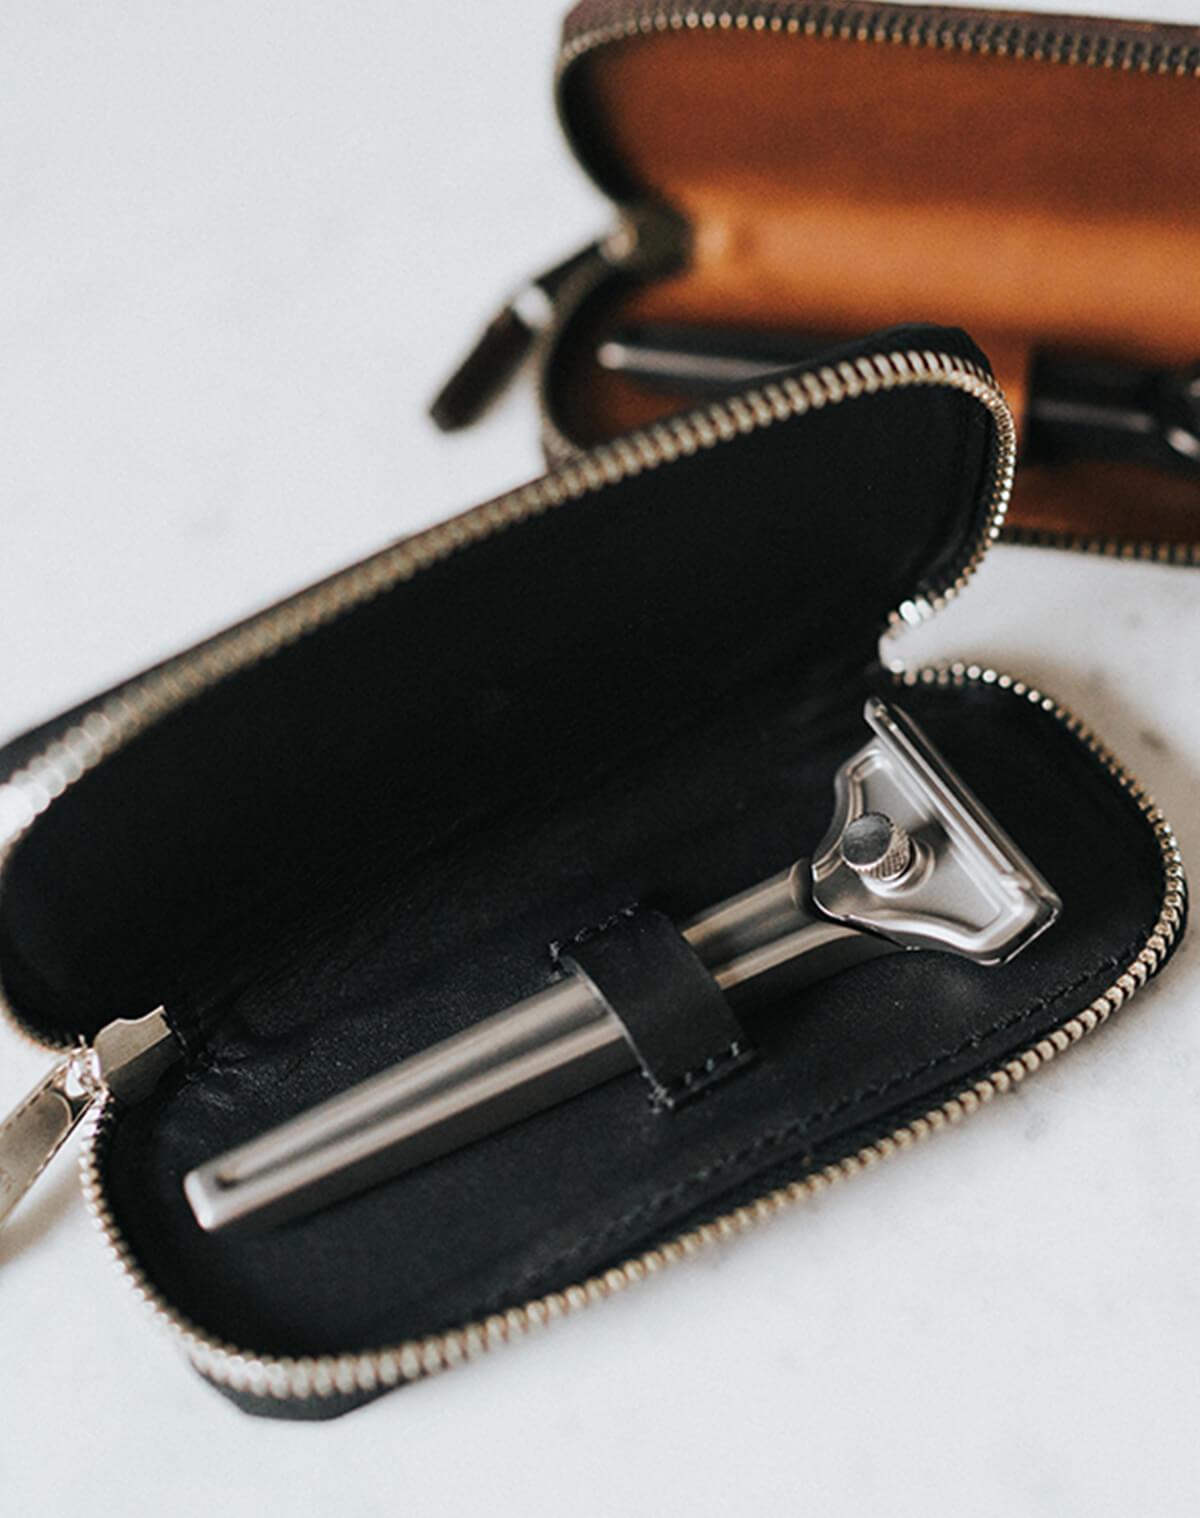 supply provision single edge razor review